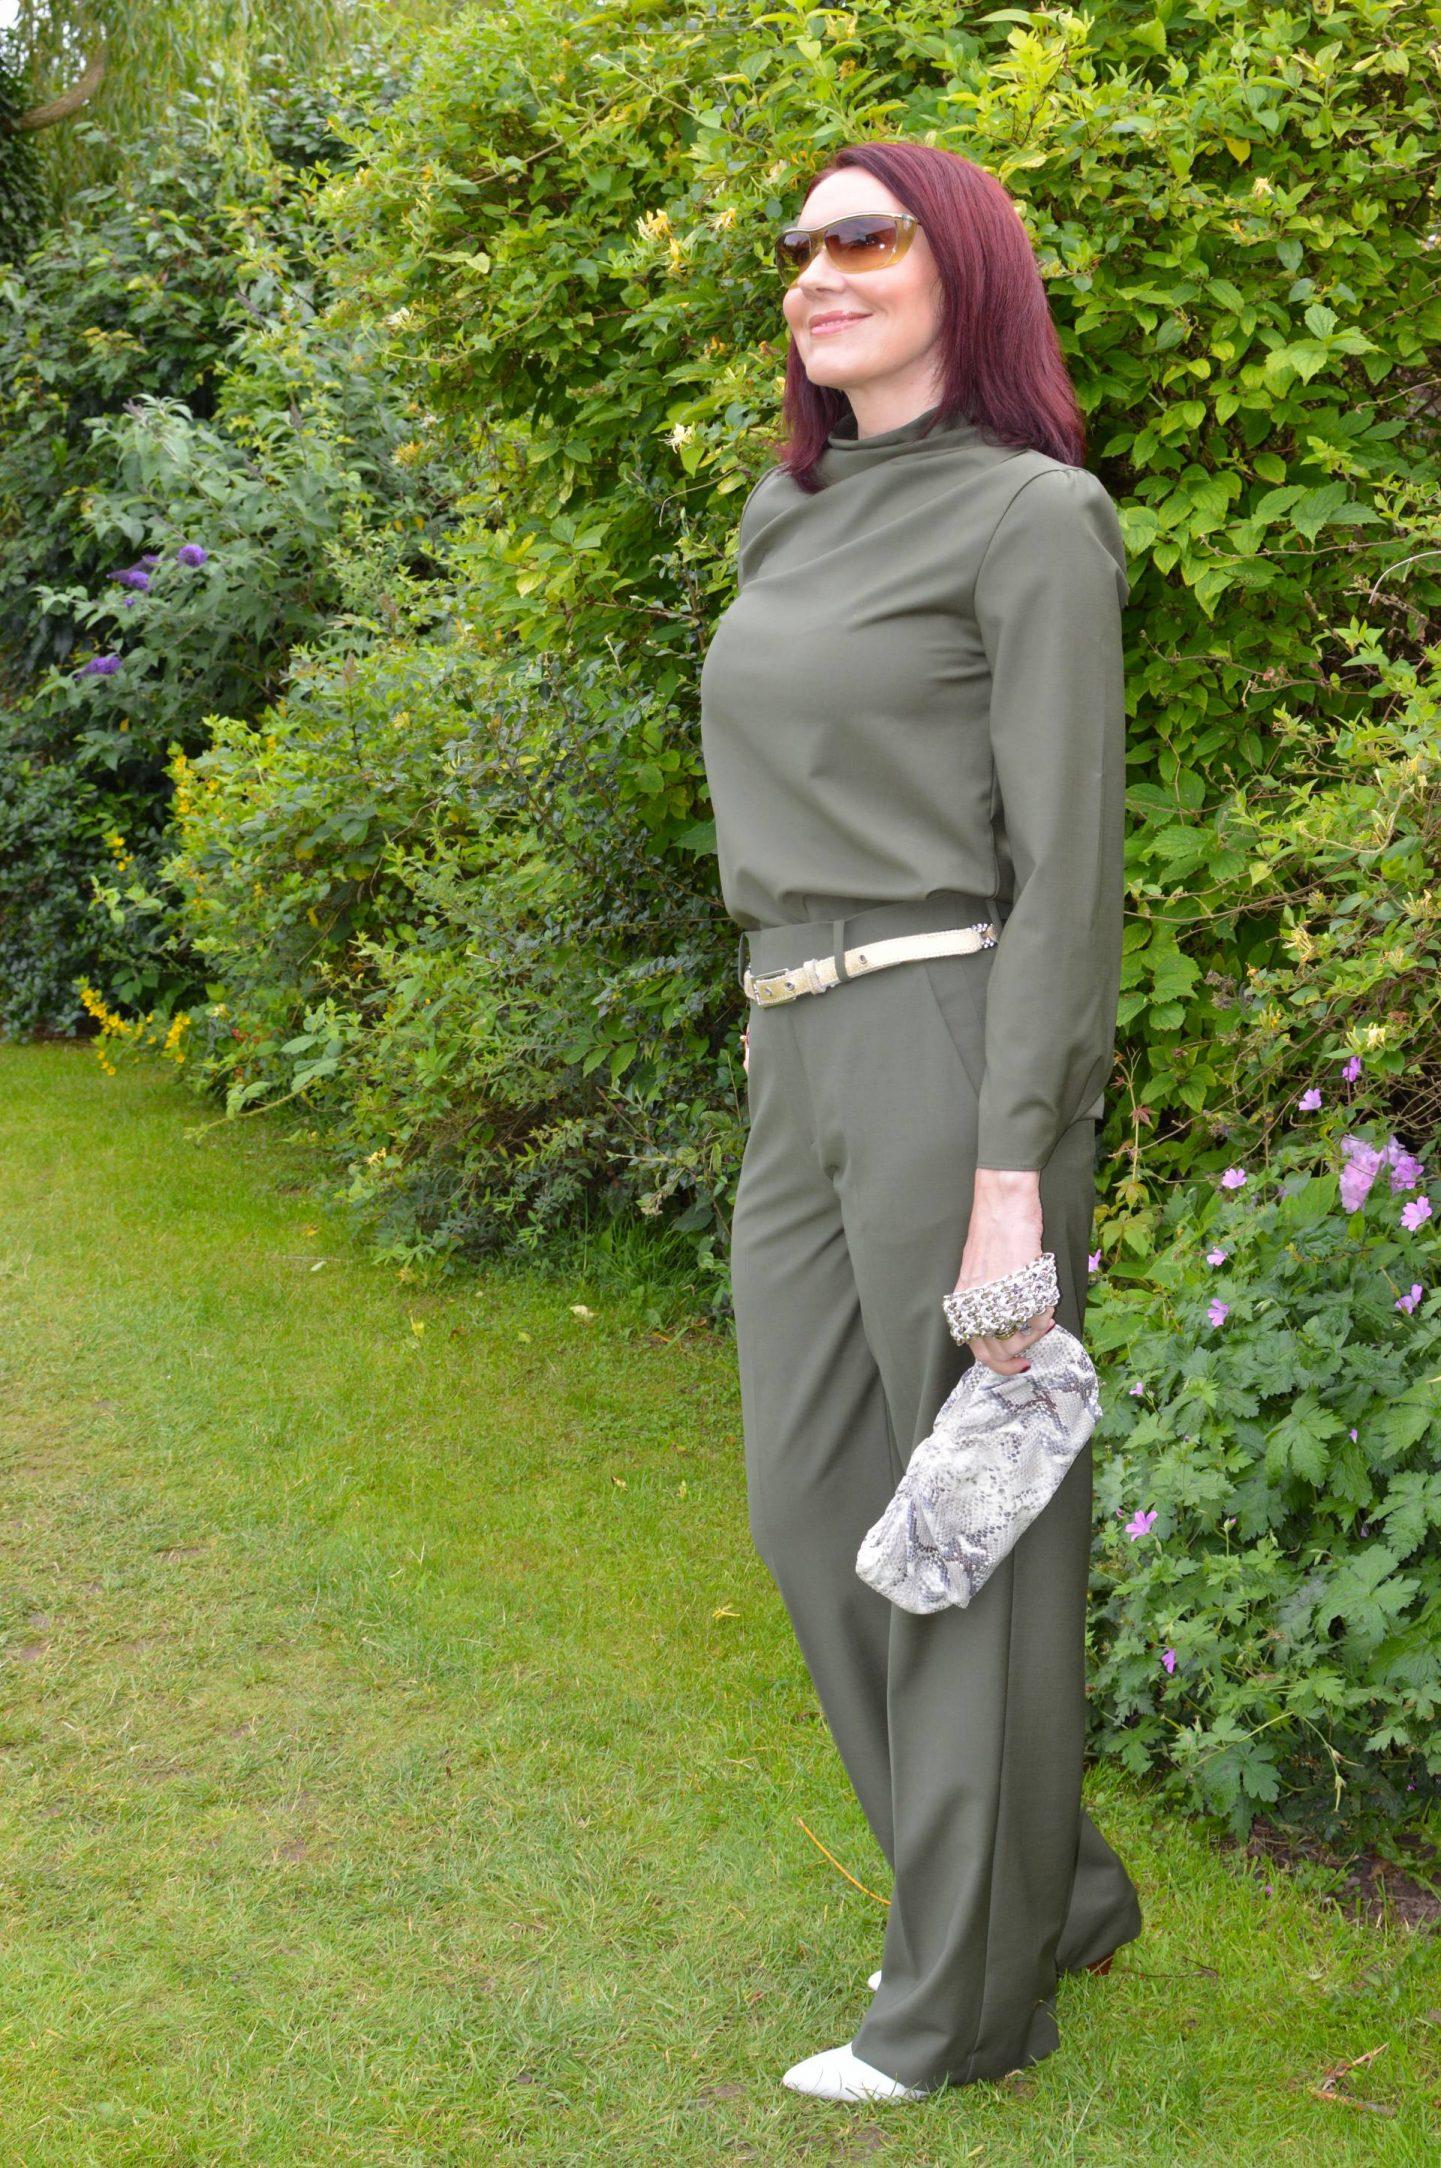 Zara Khaki Trouser Co-ord, Rodo snake print clutch